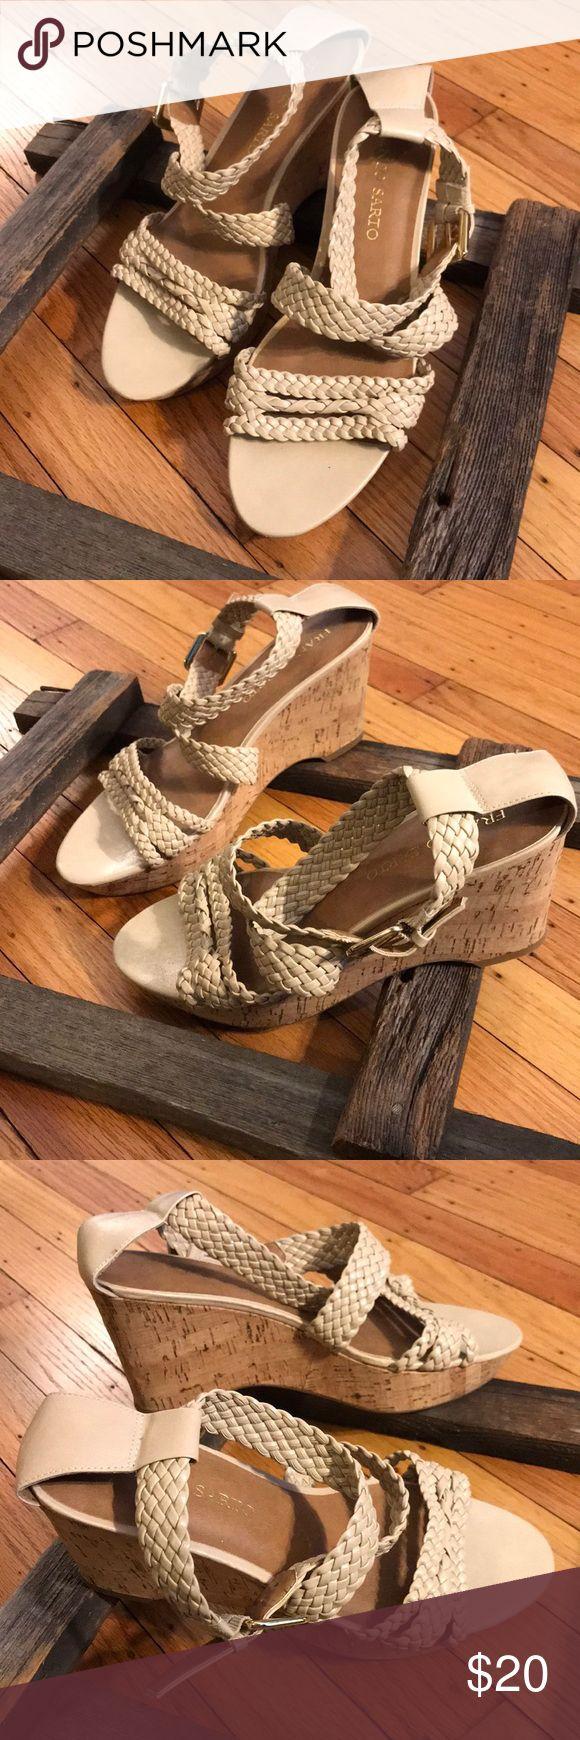 Franco Sarto sandals Beautiful Franco Sarto nude/ beige wedge sandals. Franco Sarto Shoes Sandals